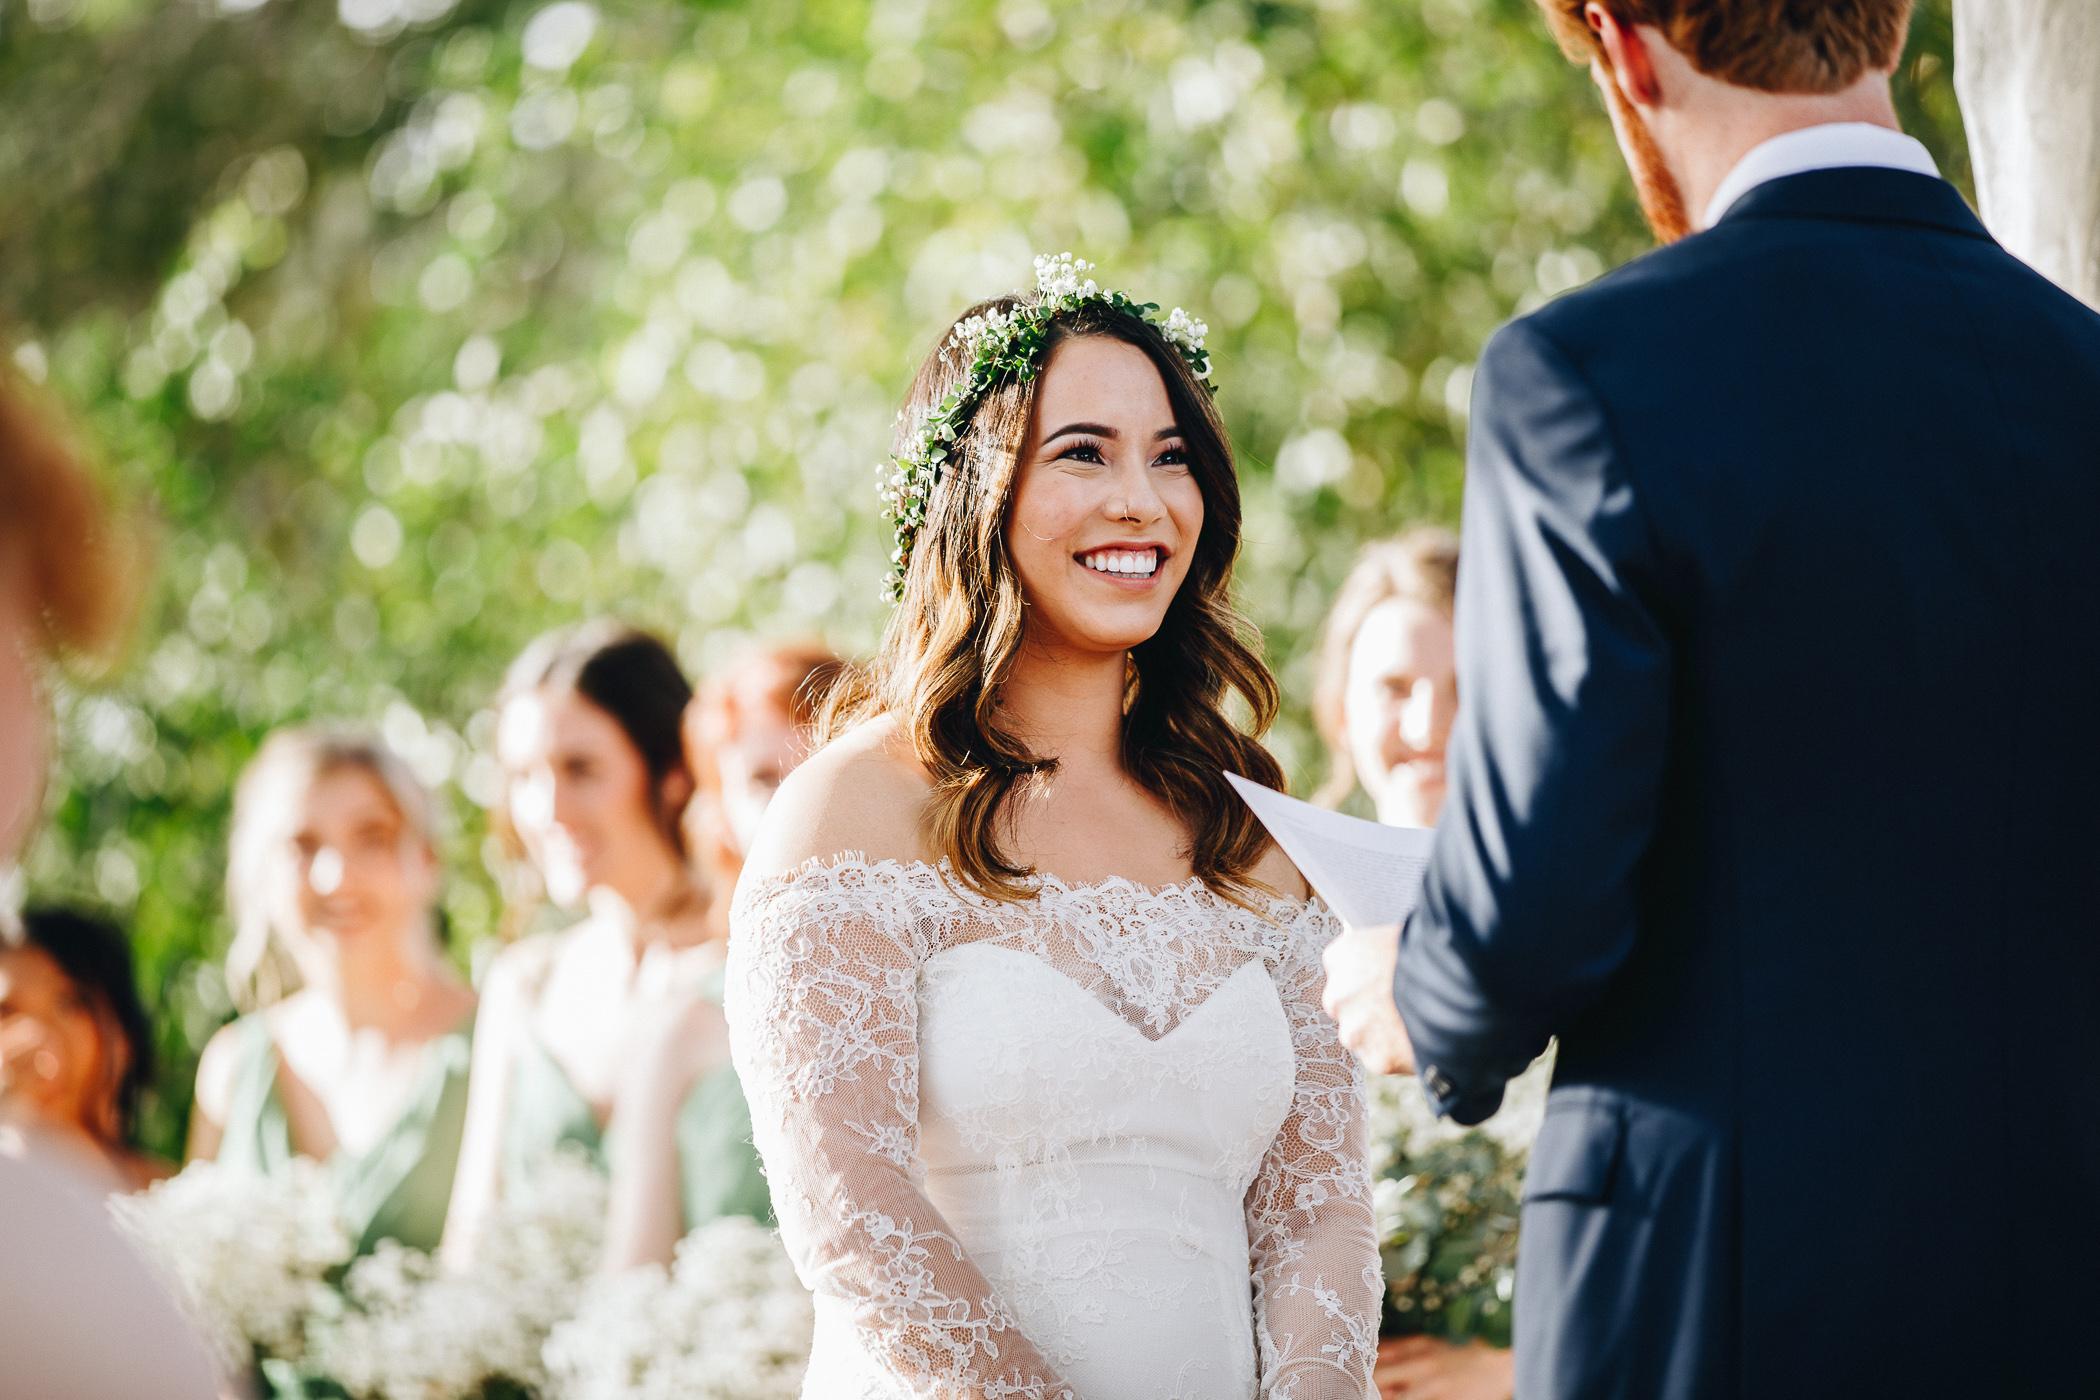 181104-Luxium-Weddings-Arizona-@matt__Le-Brandon-Kariana-Phoenix-Valley-Garden-Center-1069.jpg